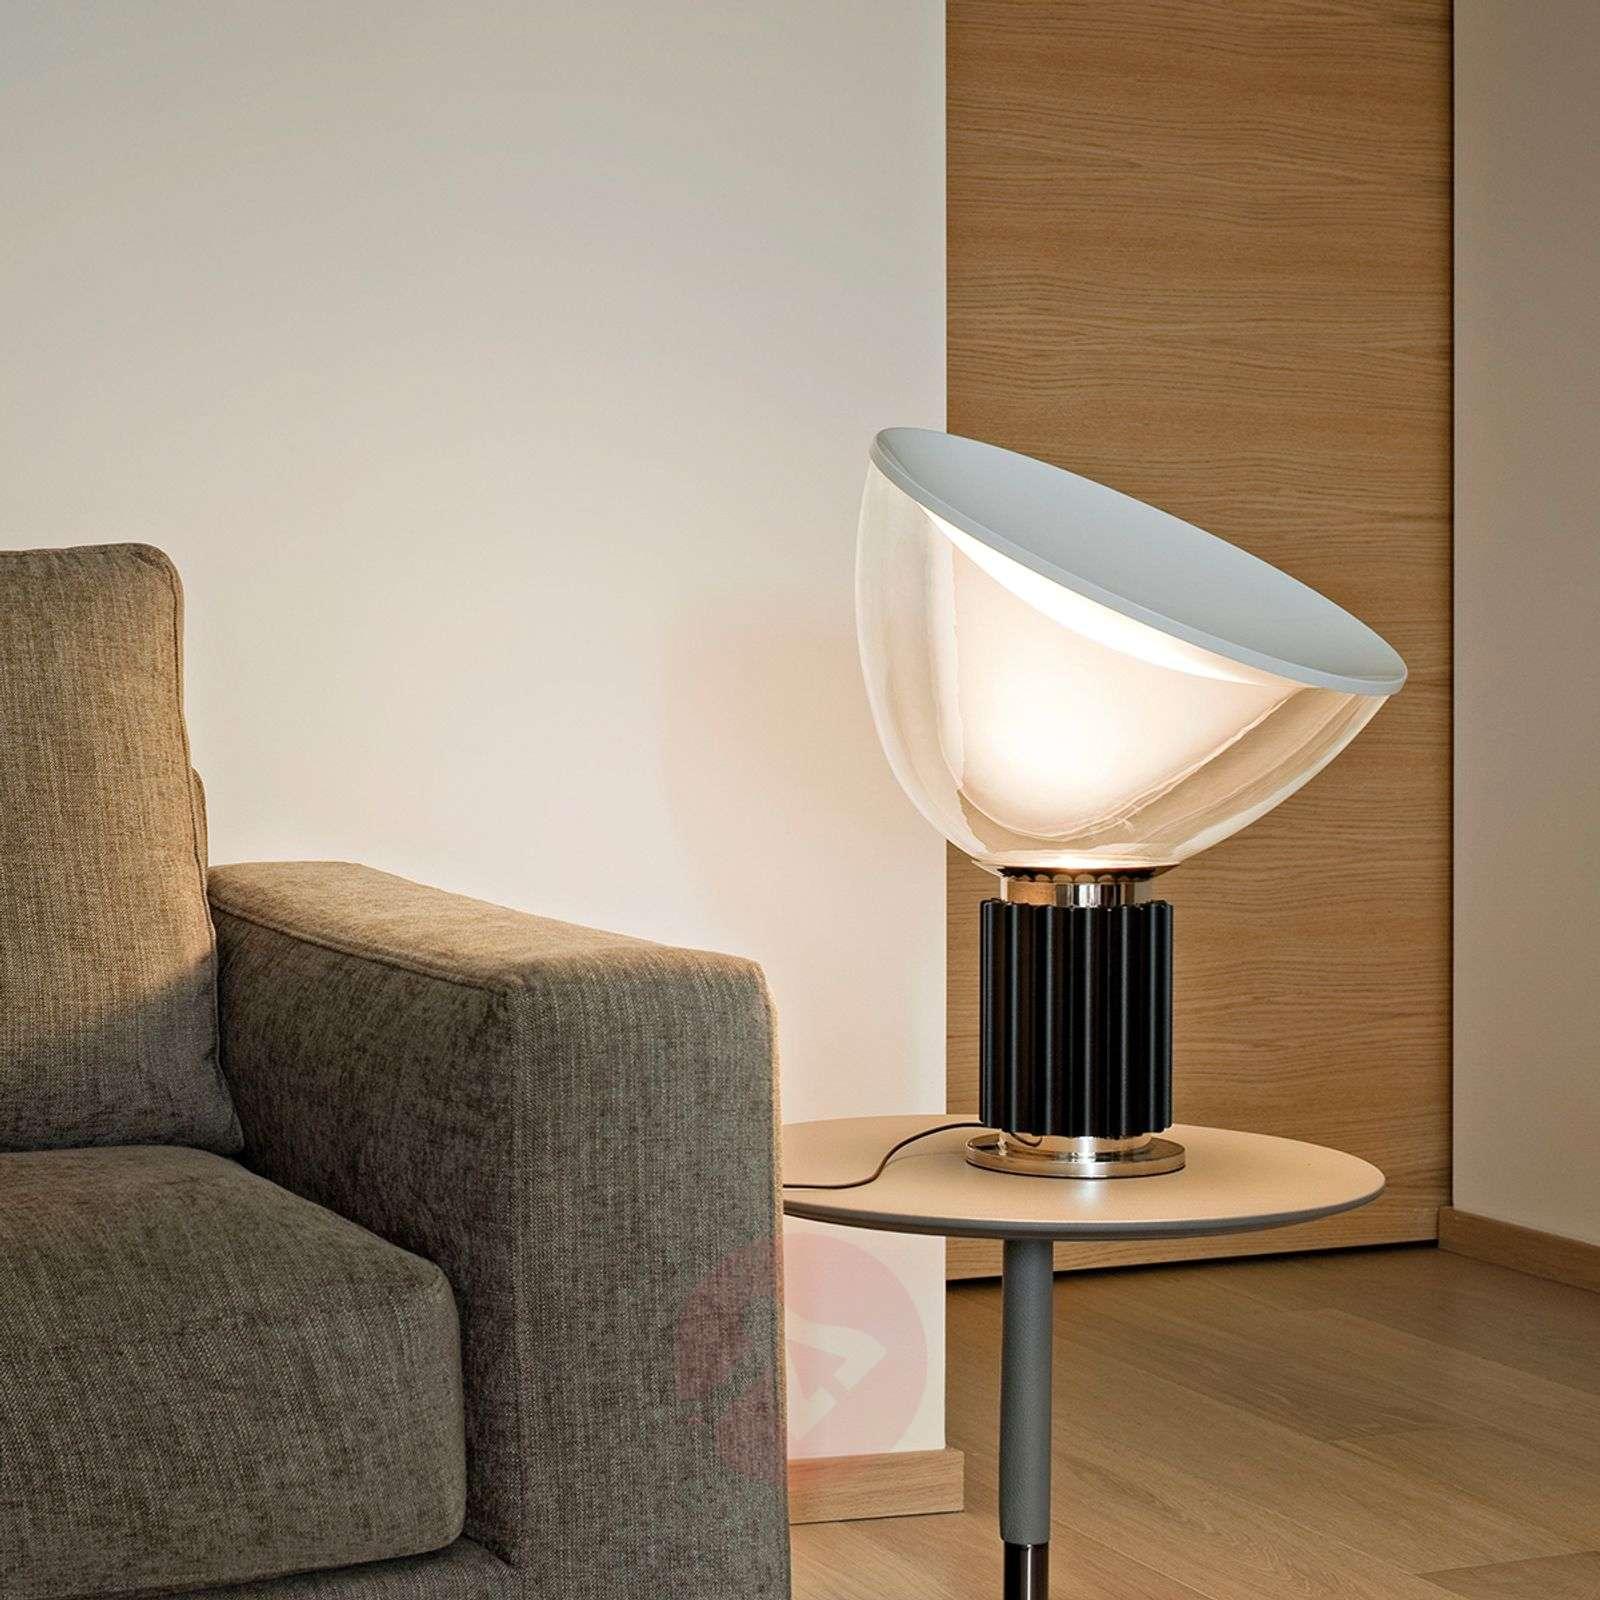 Taccia small-design-LED-pöytävalaisin-3510366X-03